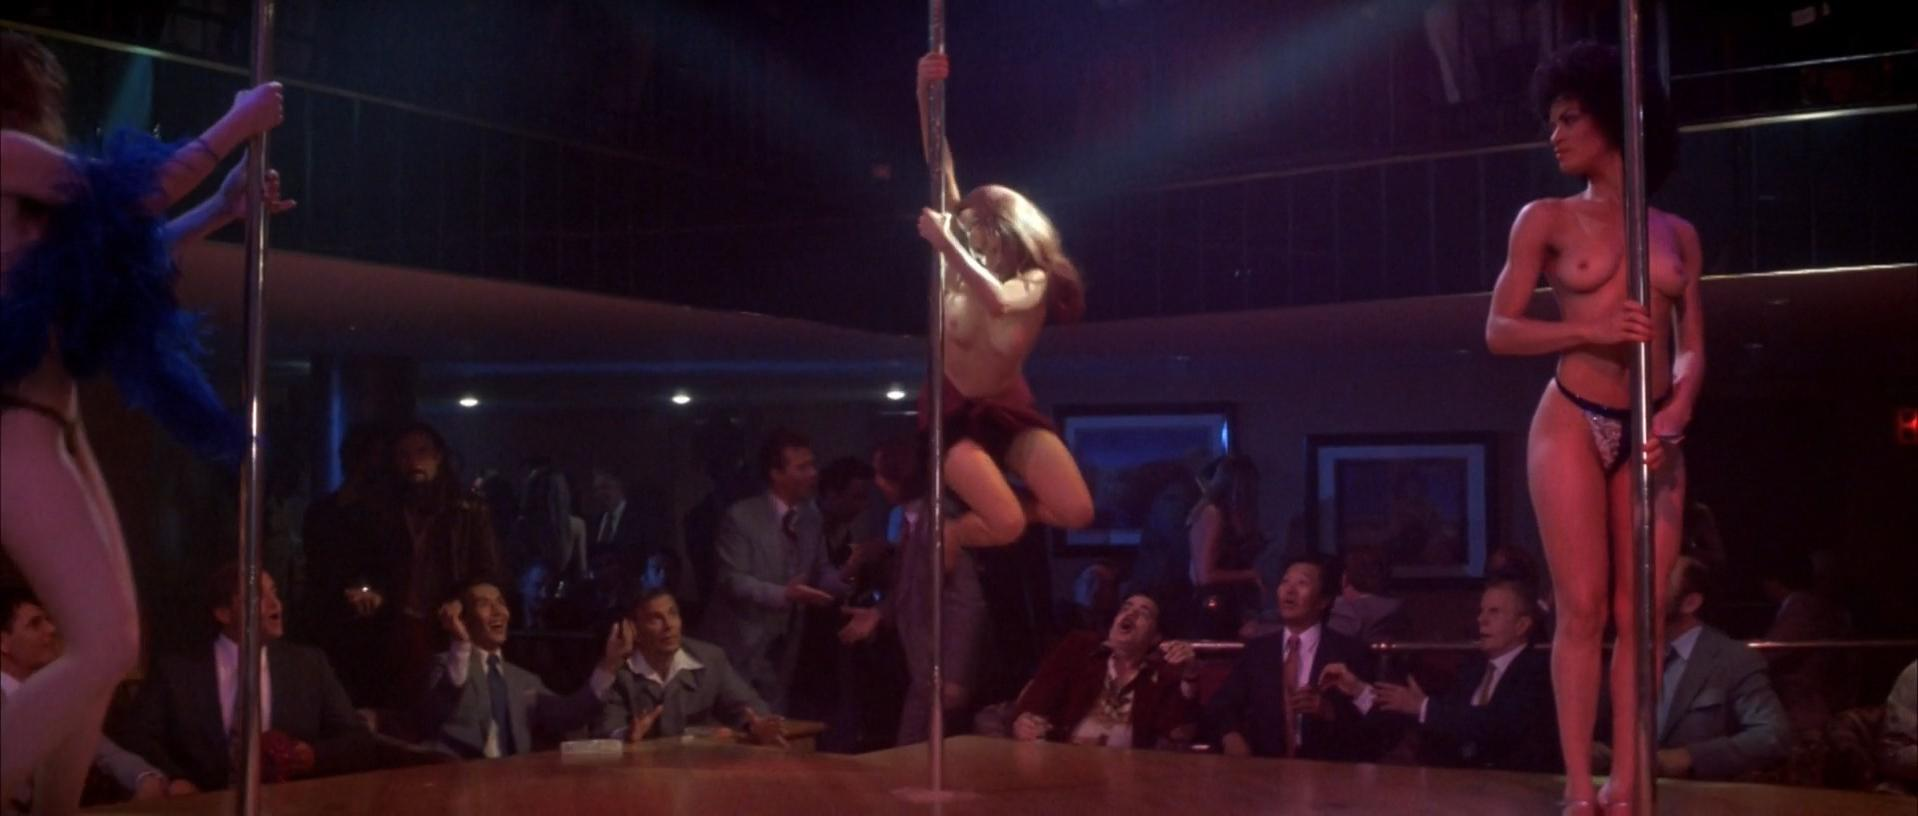 Penelope Ann Miller nude - Carlito's Way (1993)